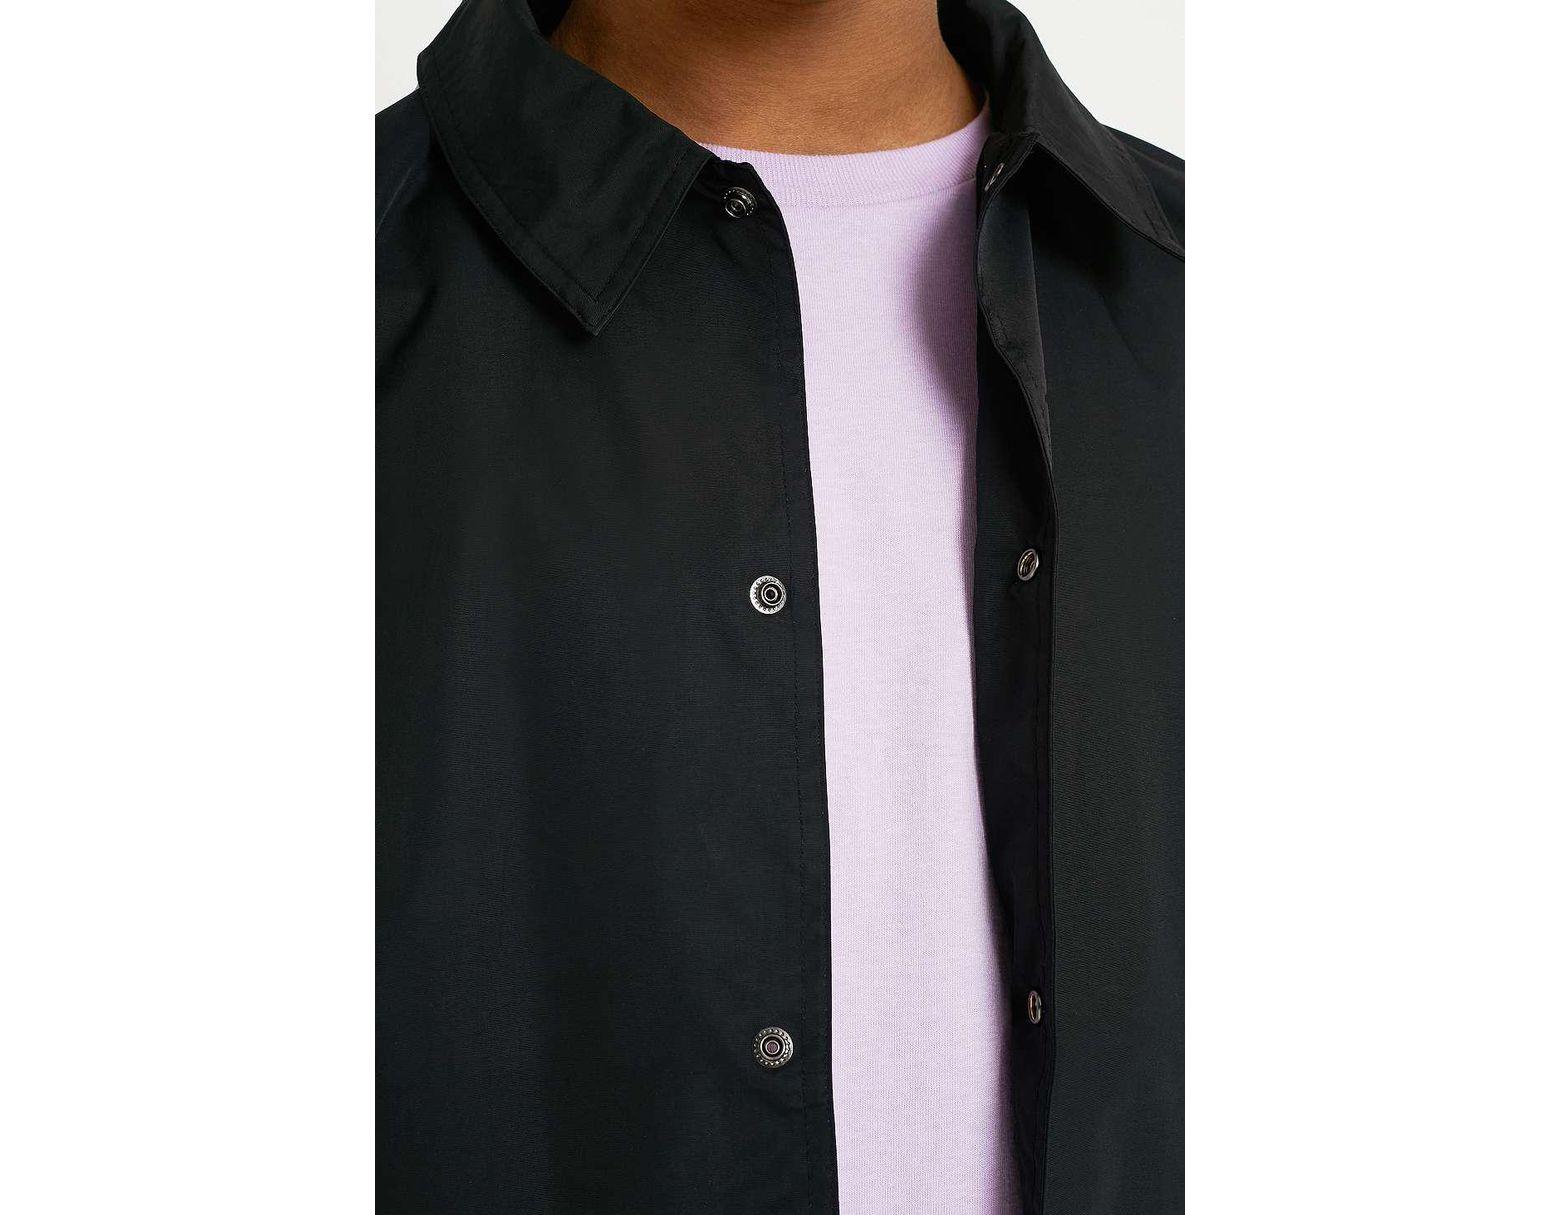 895c7444 Men's Torrance Black Coach Jacket